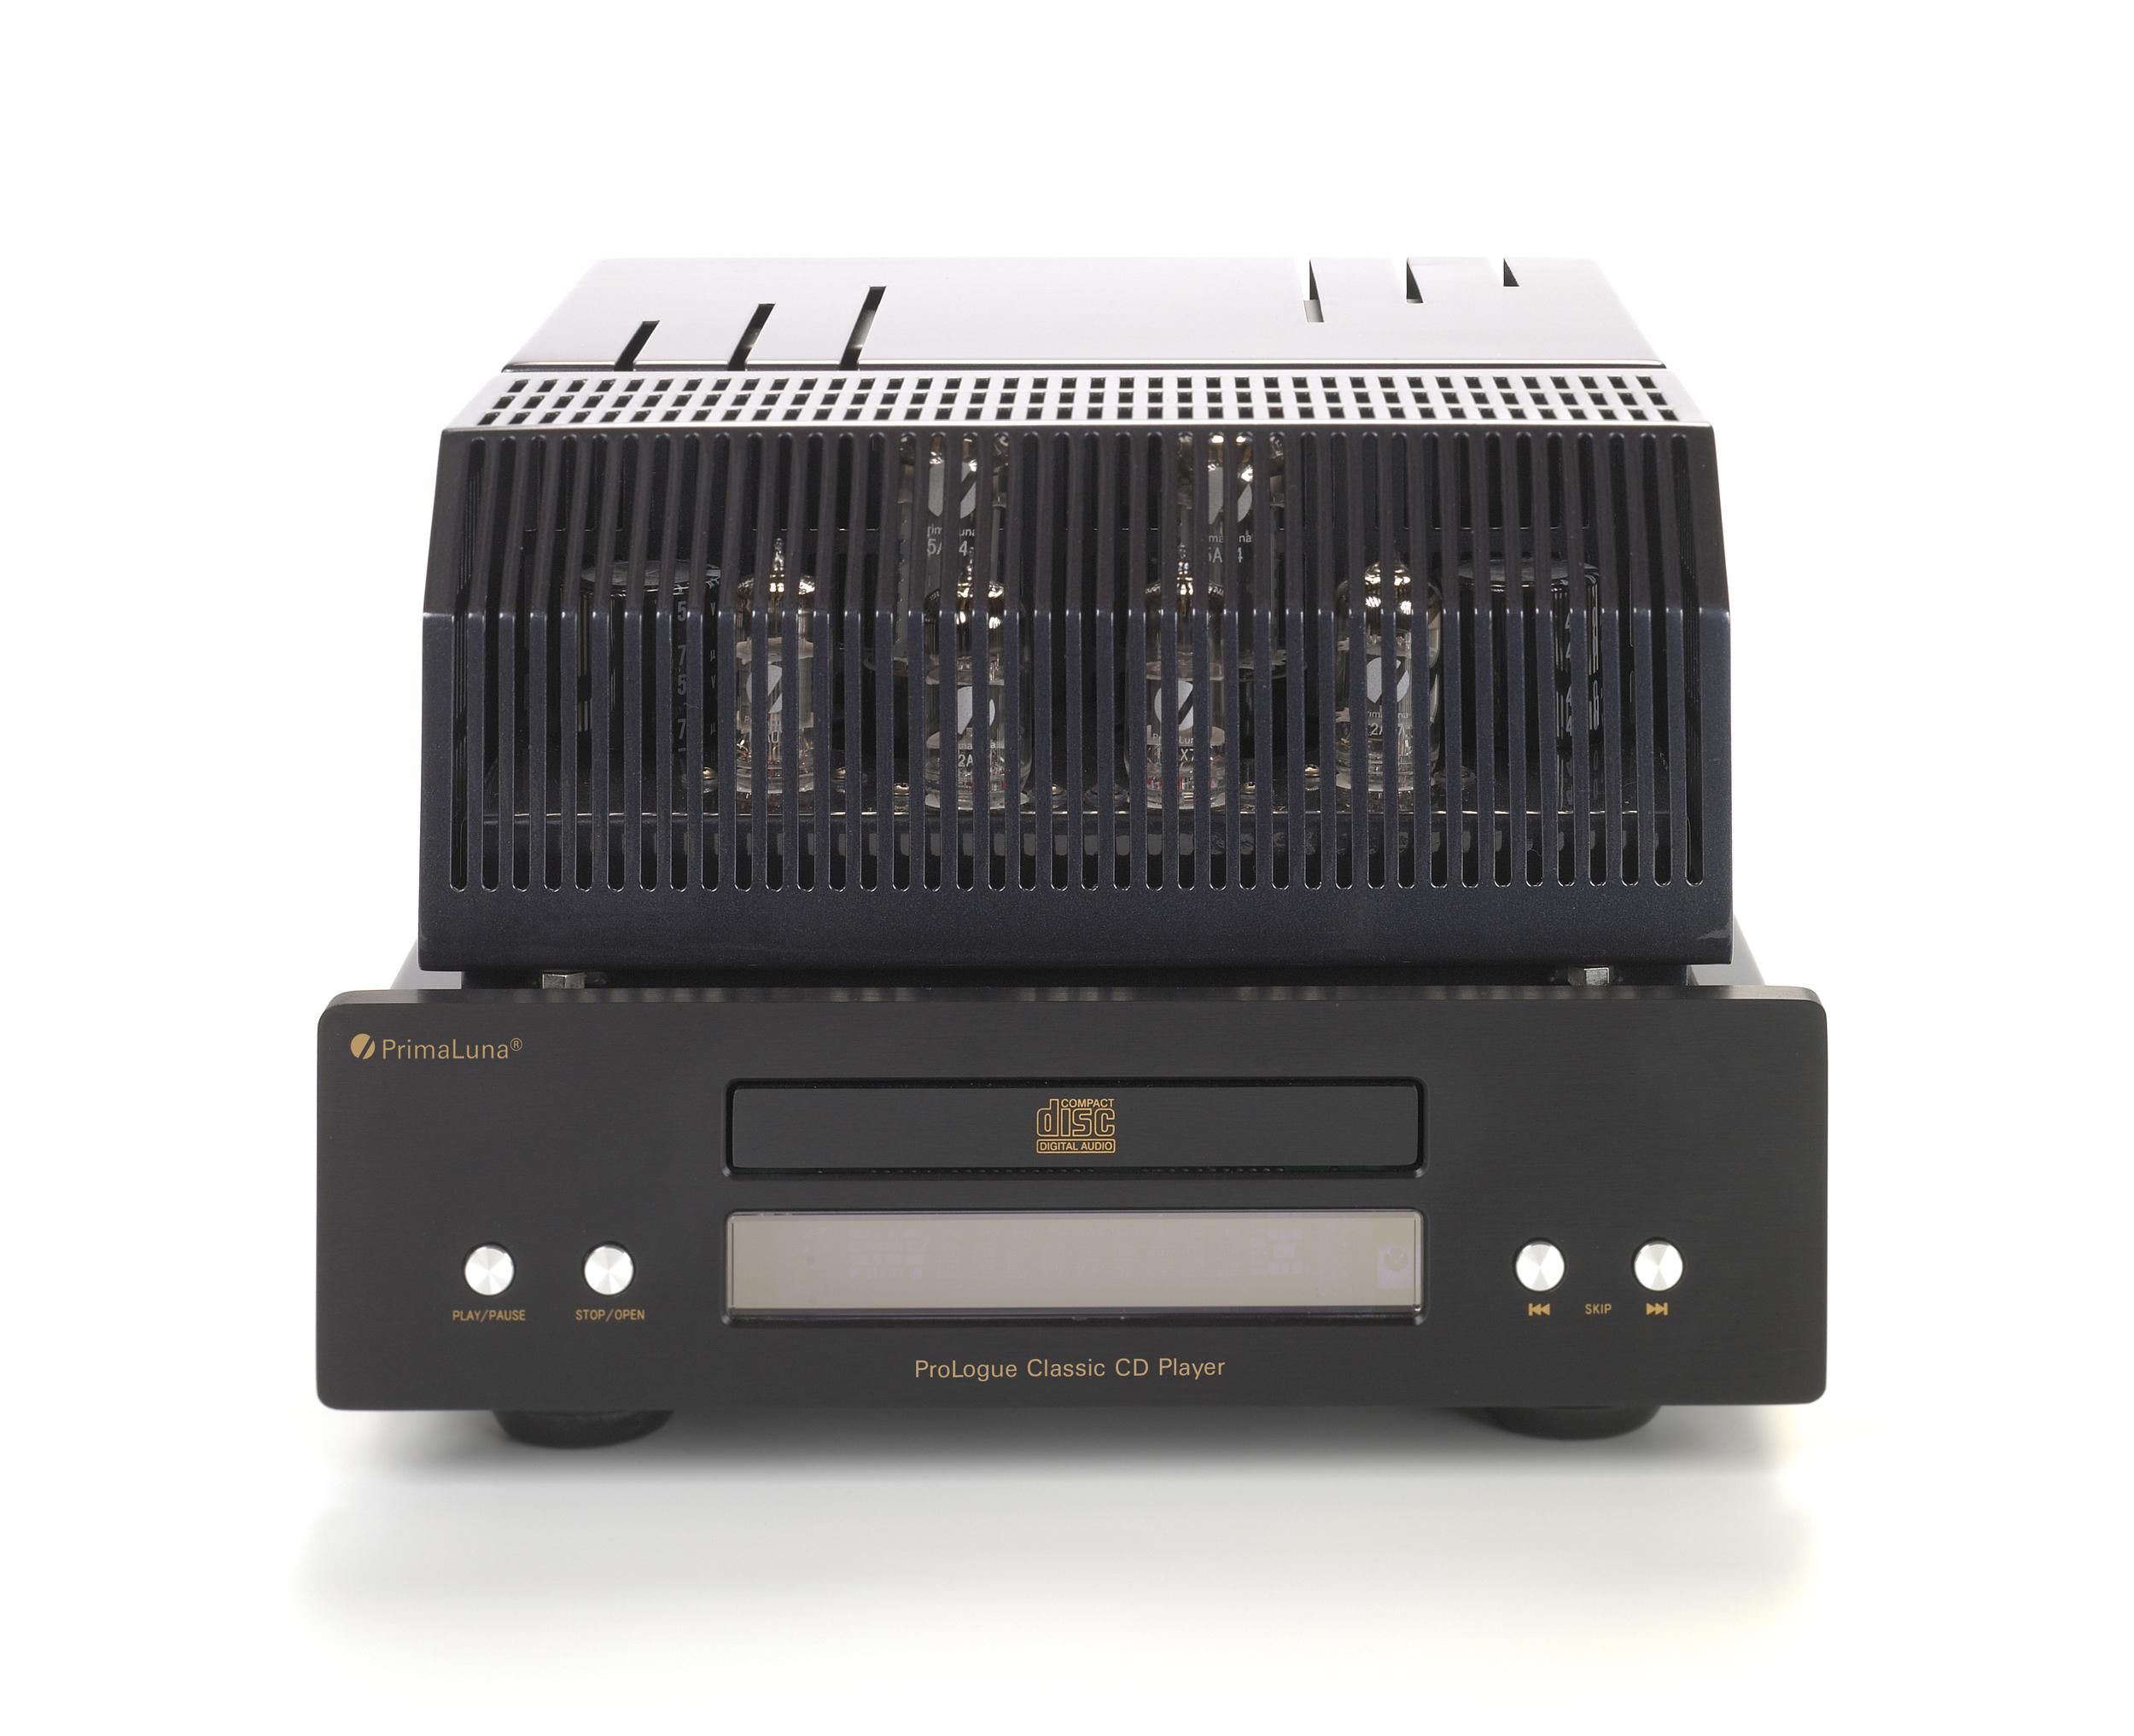 014-PrimaLuna Classic CD Player-zwart.jpg